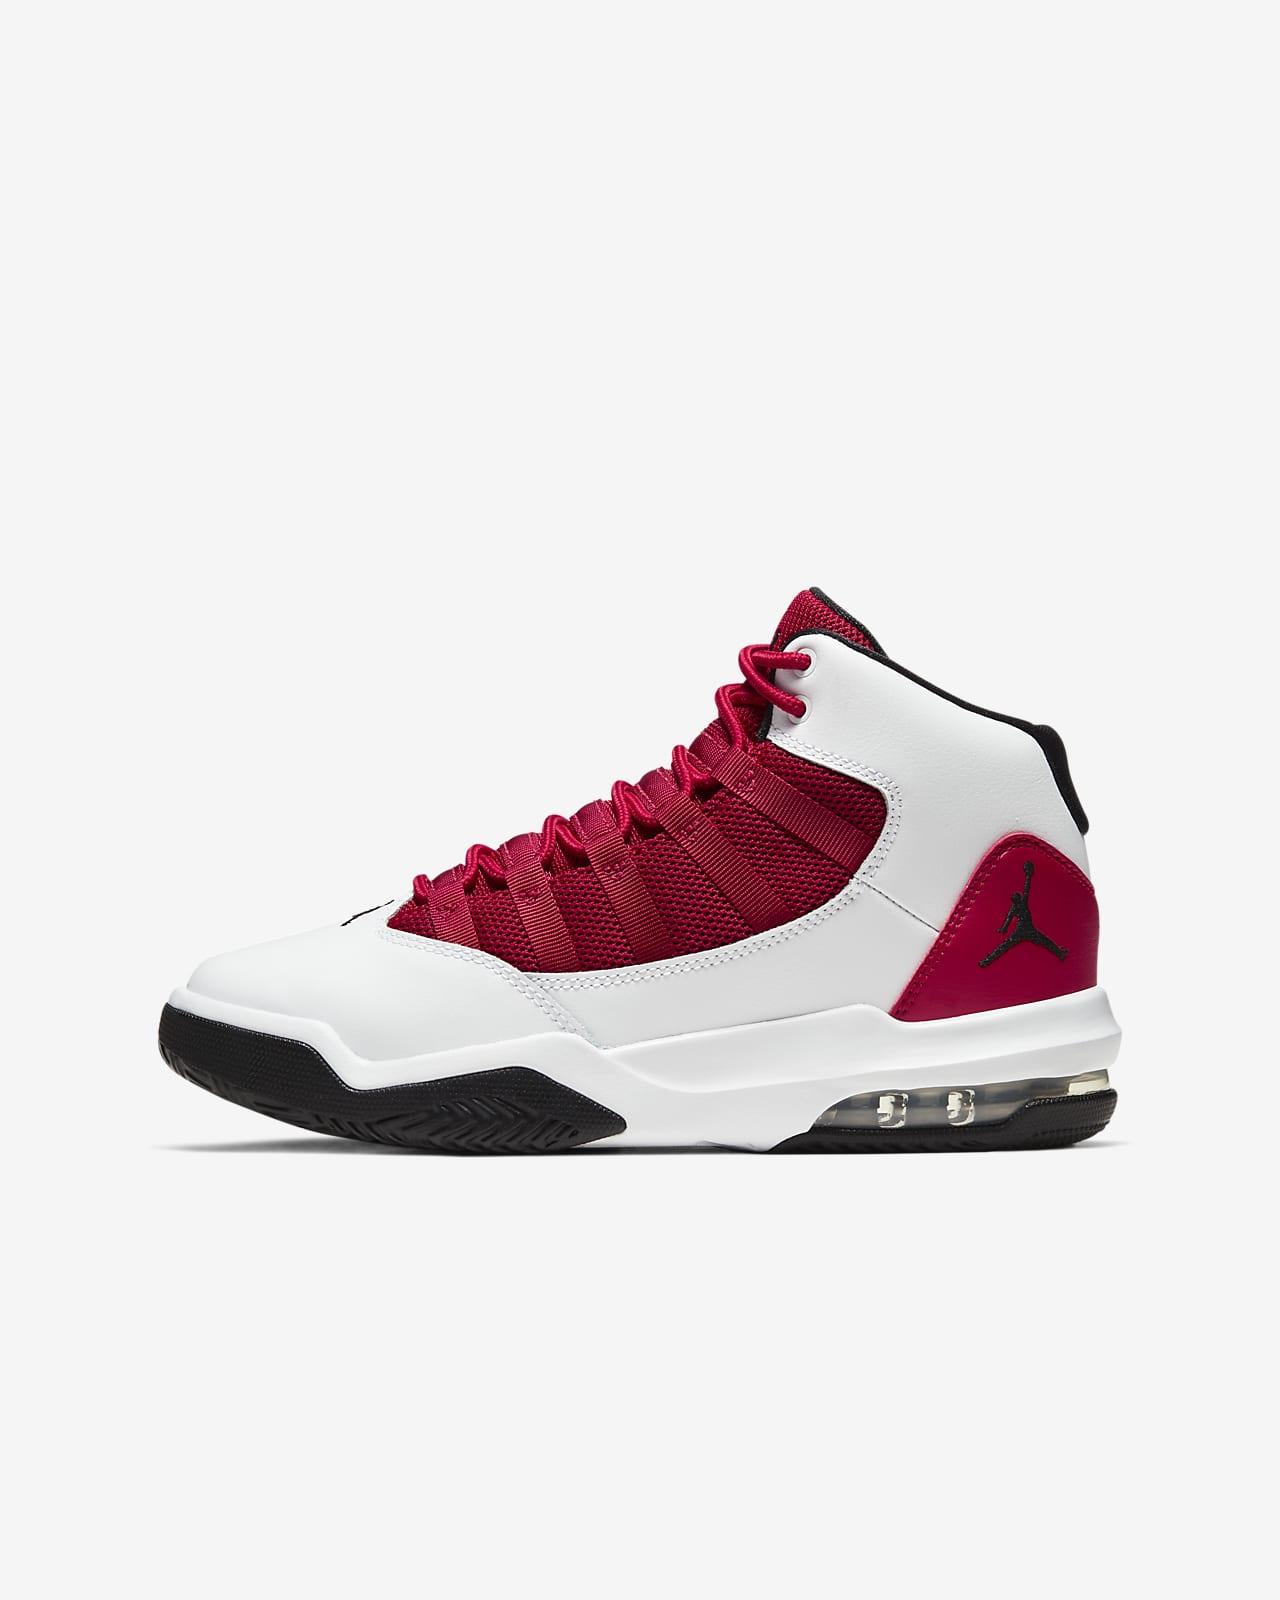 Jordan Max Aura Older Kids' Shoe. Nike LU